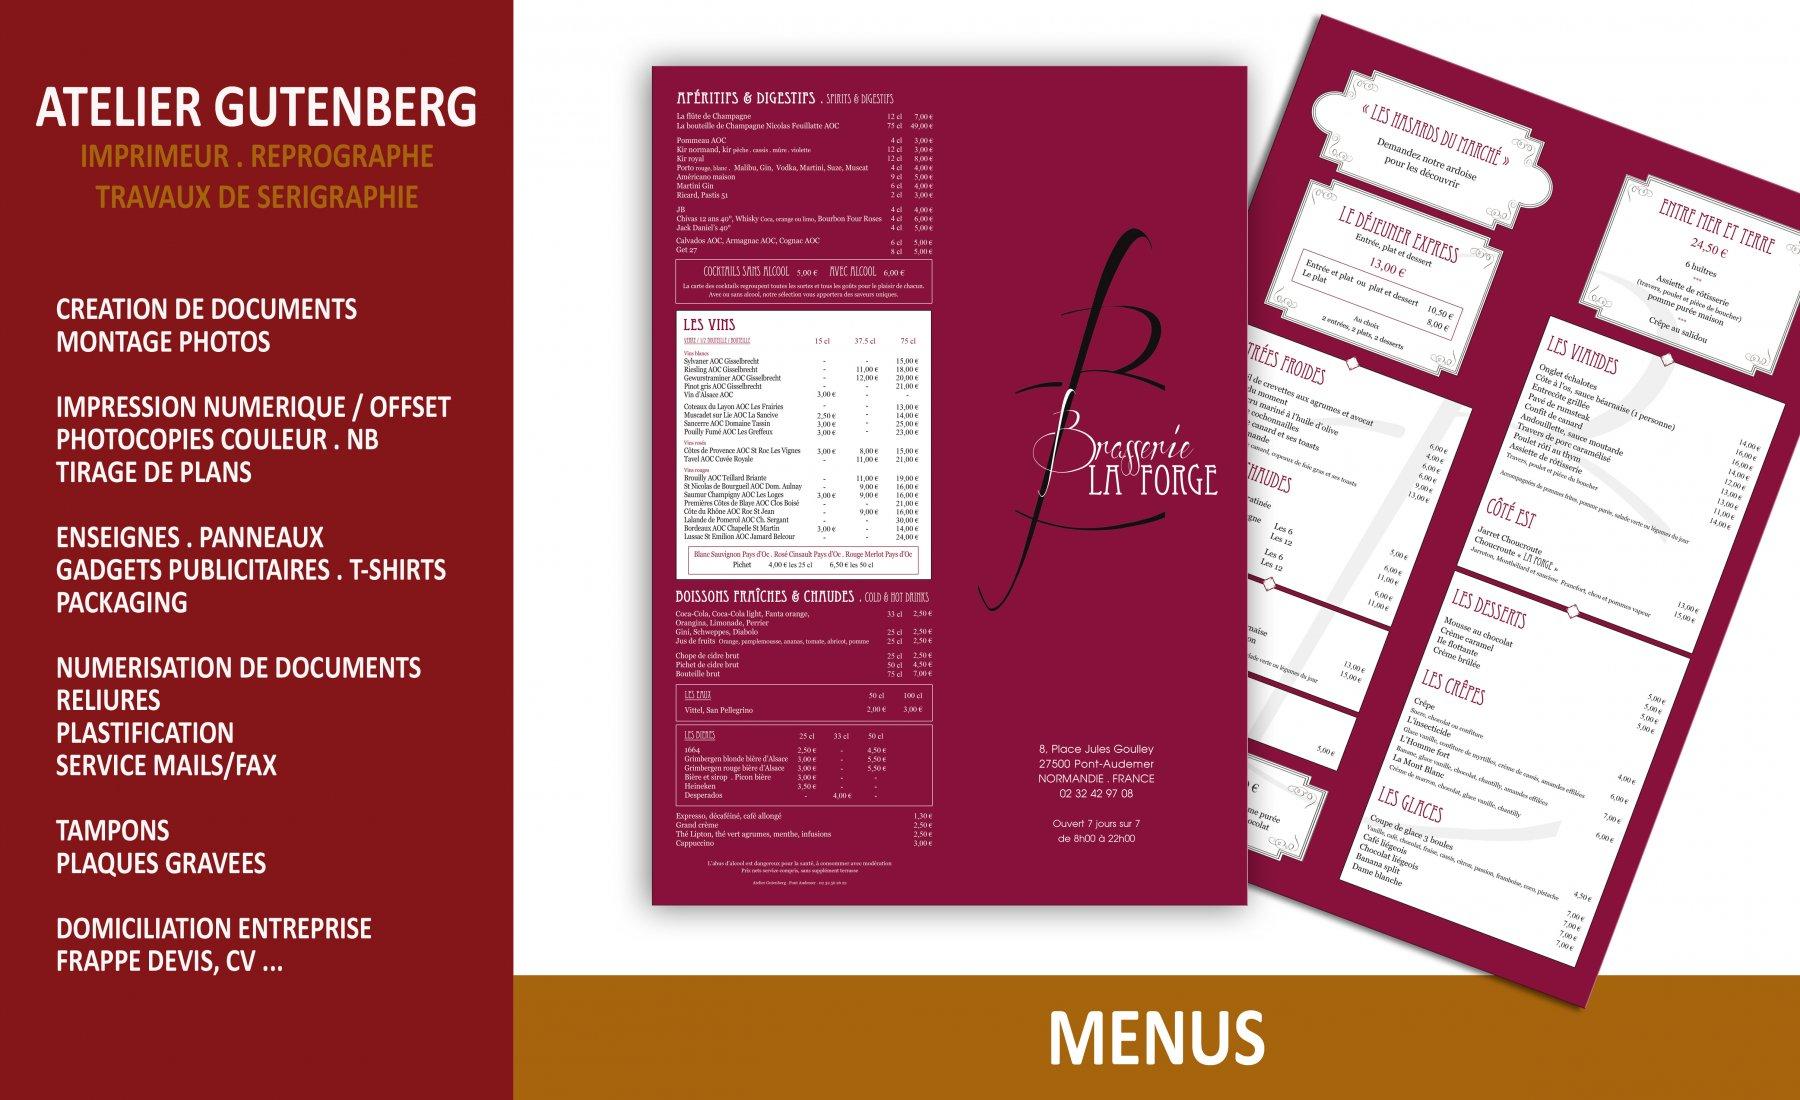 atelier gutenberg menu format 29.7 x 42 avec 1 pli impression quadri recto verso avec un pelliculage mat